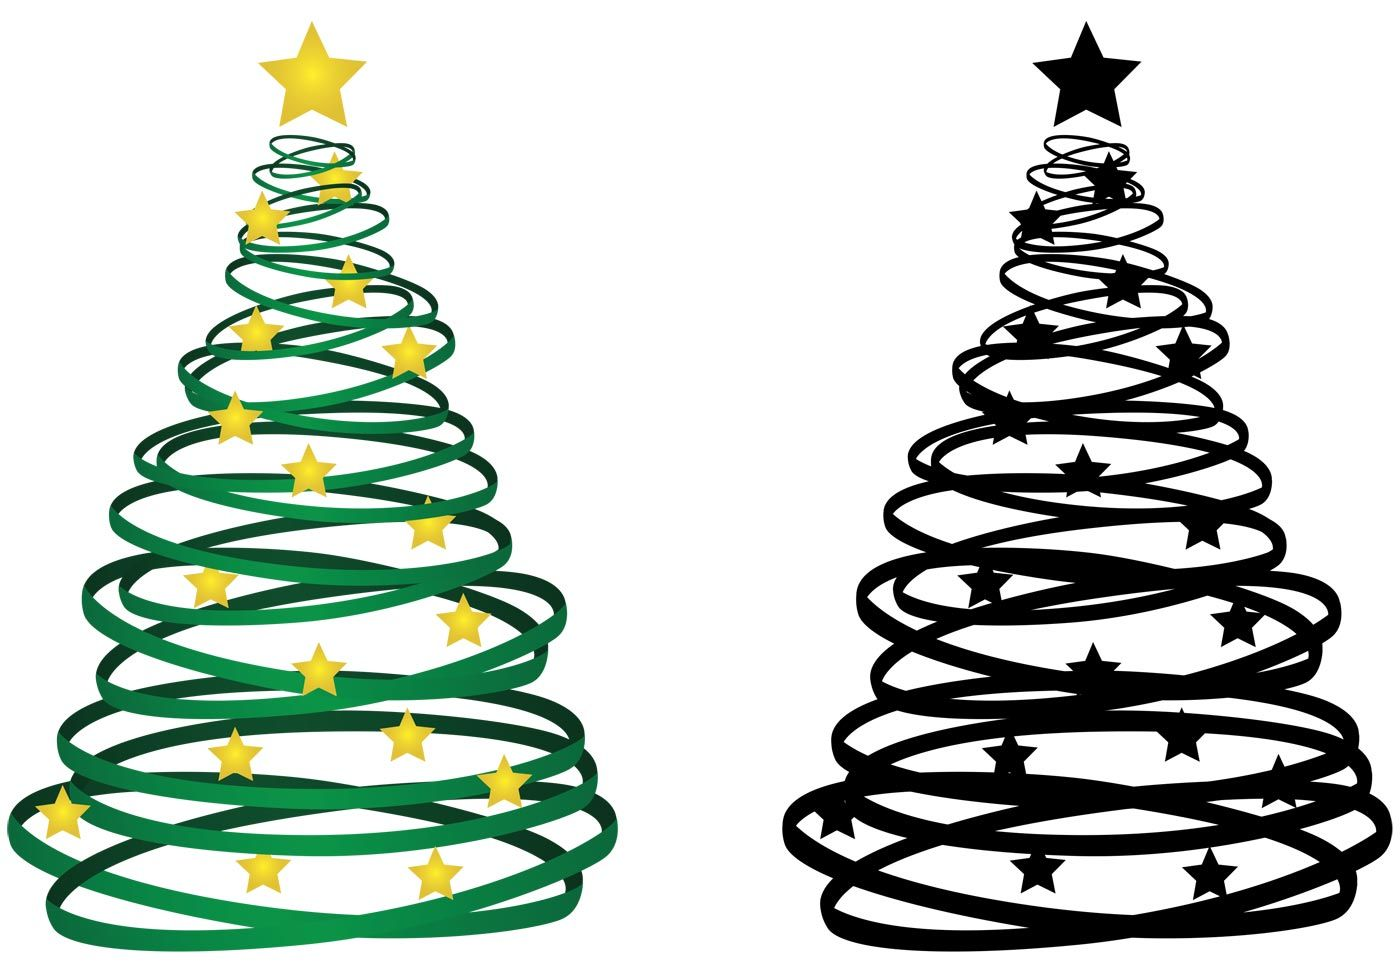 Ribbon Christmas Tree Vector Free Vector Art At Vecteezy Cool Christmas Trees Christmas Tree Ornaments Wallpaper Ribbon On Christmas Tree